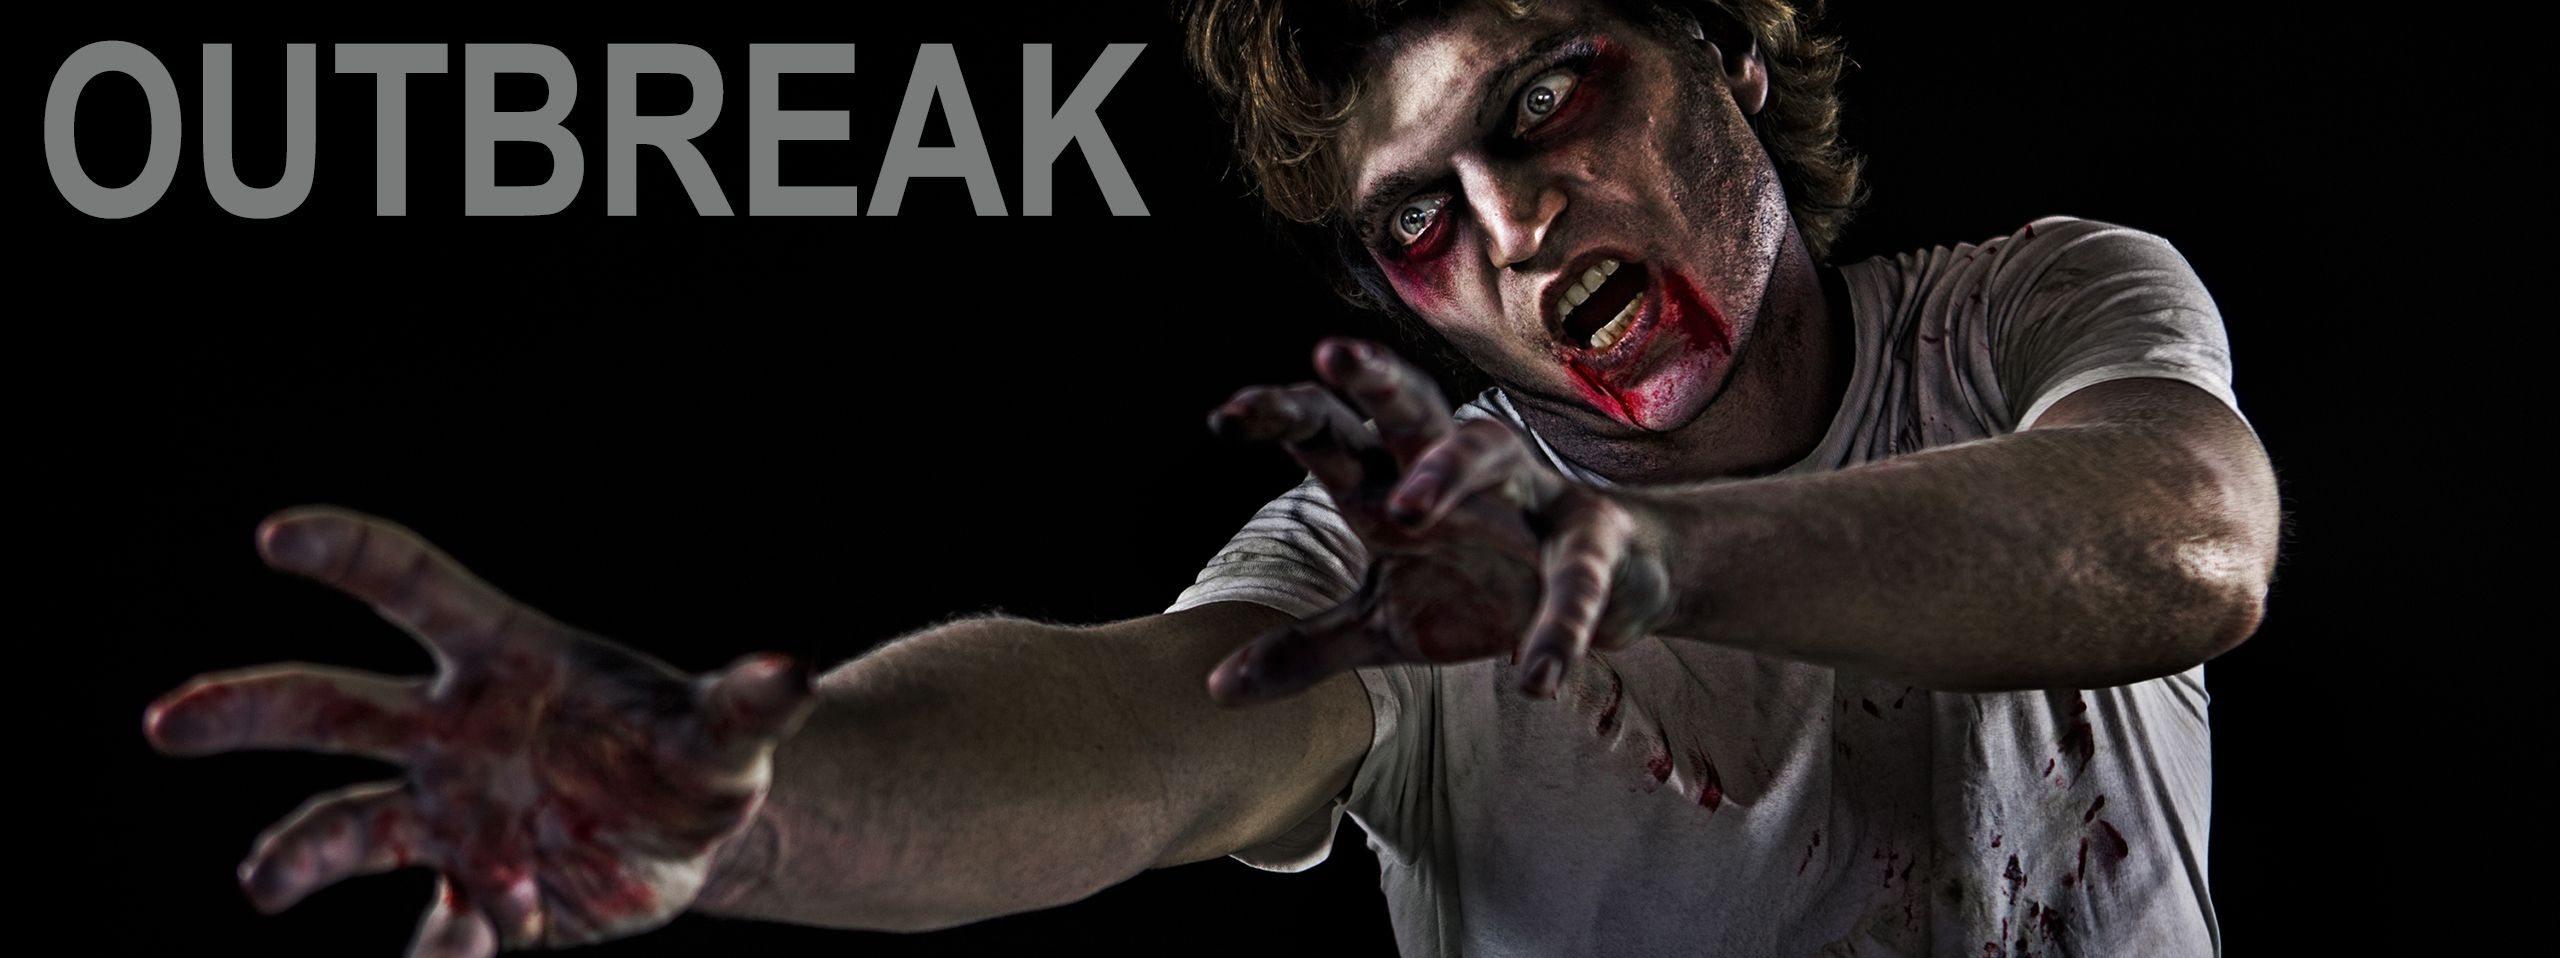 big_escape_outbreak_header